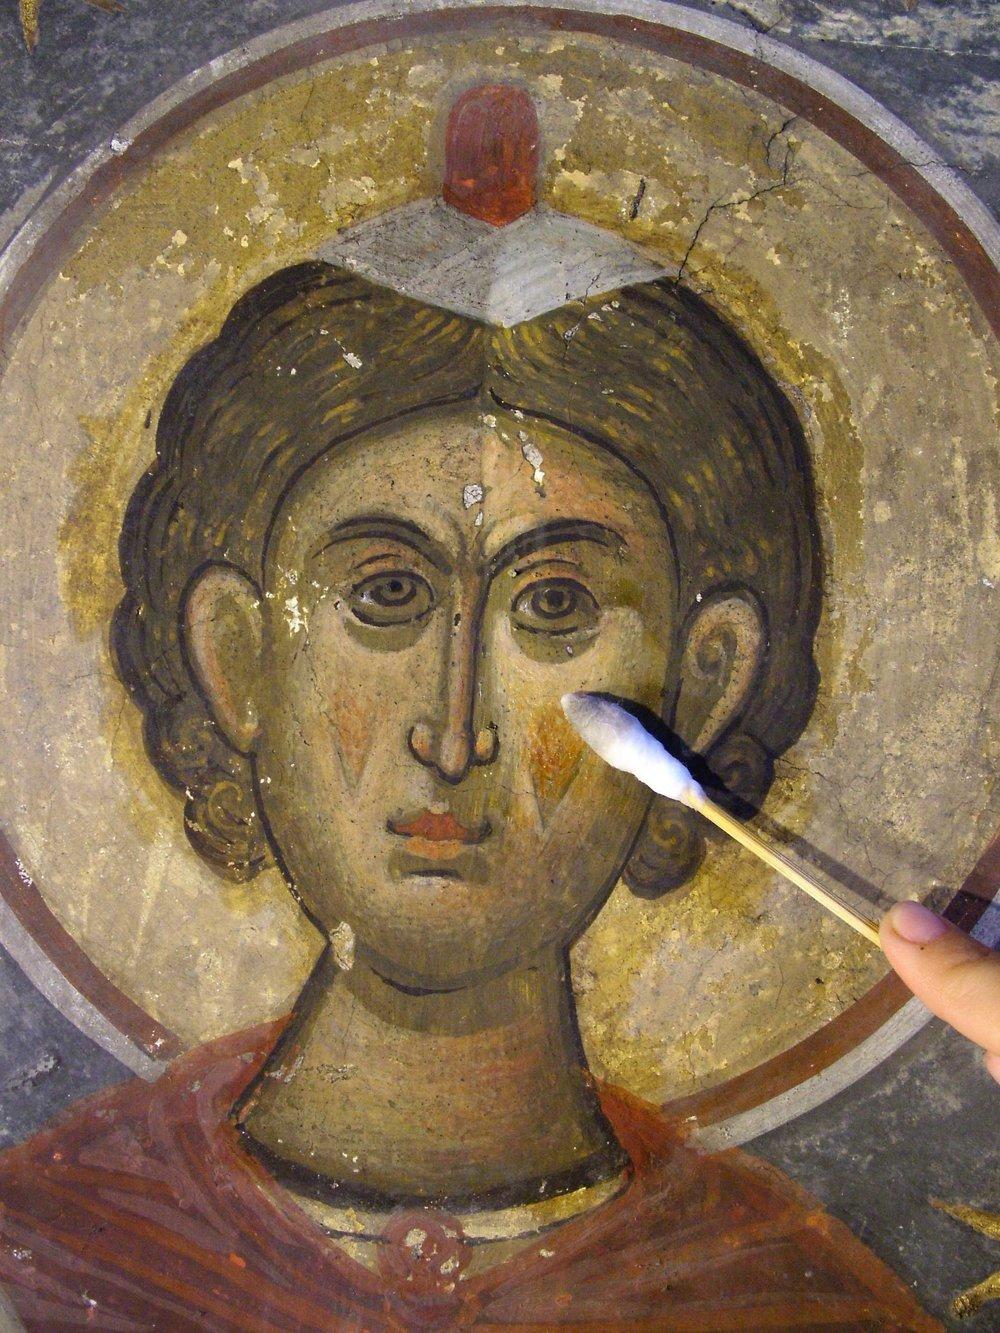 Detail during cleaning, Karanlık Kilise, Göreme Valley, Turkey